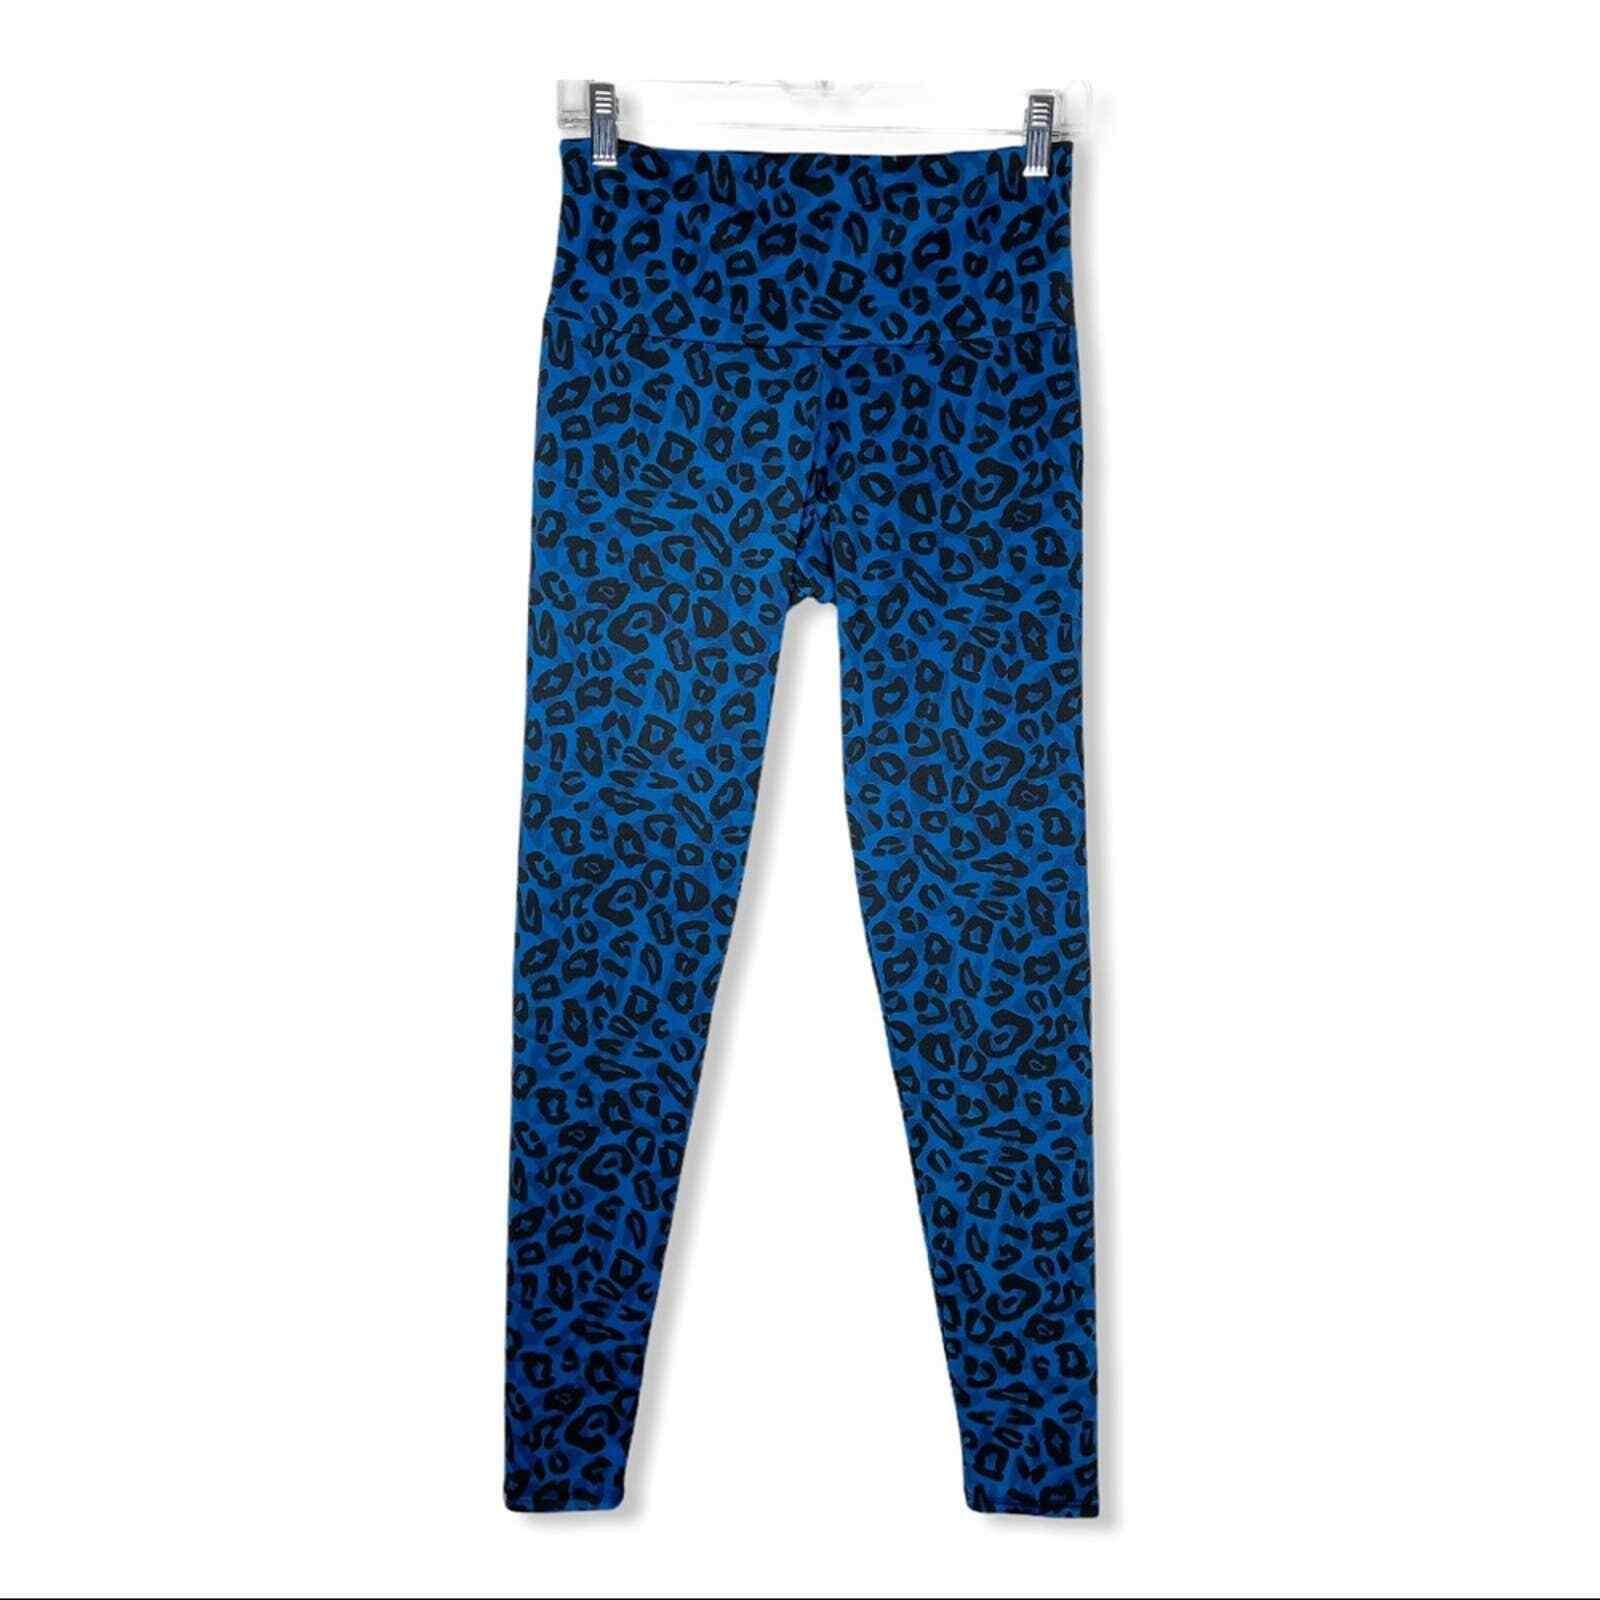 Onzie Blue Leopard Cheetah Print Athletic High Waisted Leggings Women's Size M/L